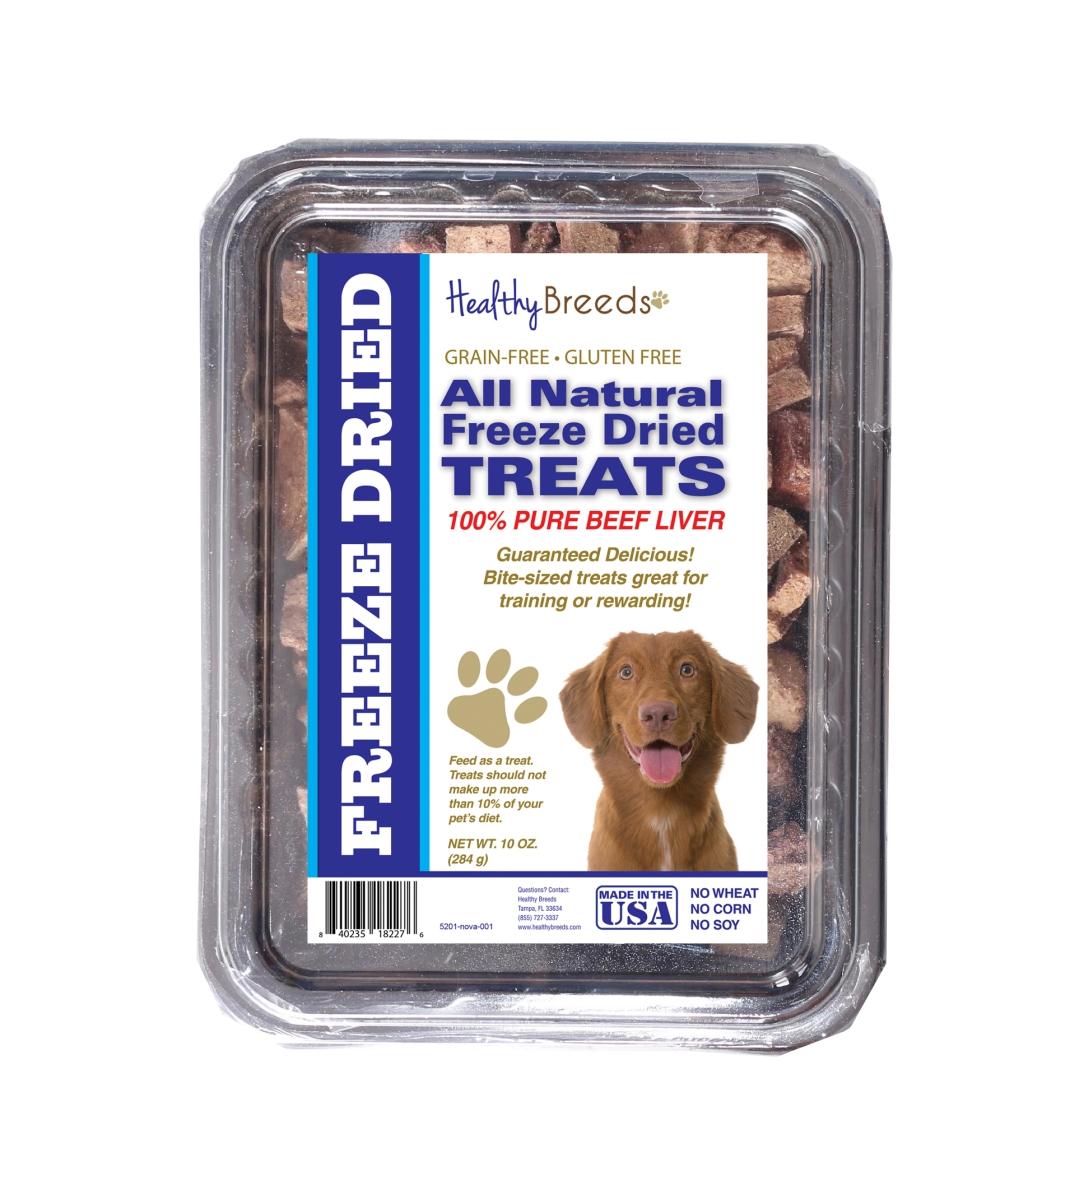 Healthy Breeds 840235182276 10 oz Nova Scotia Duck Tolling Retriever All Natural Freeze Dried Treats Beef Liver